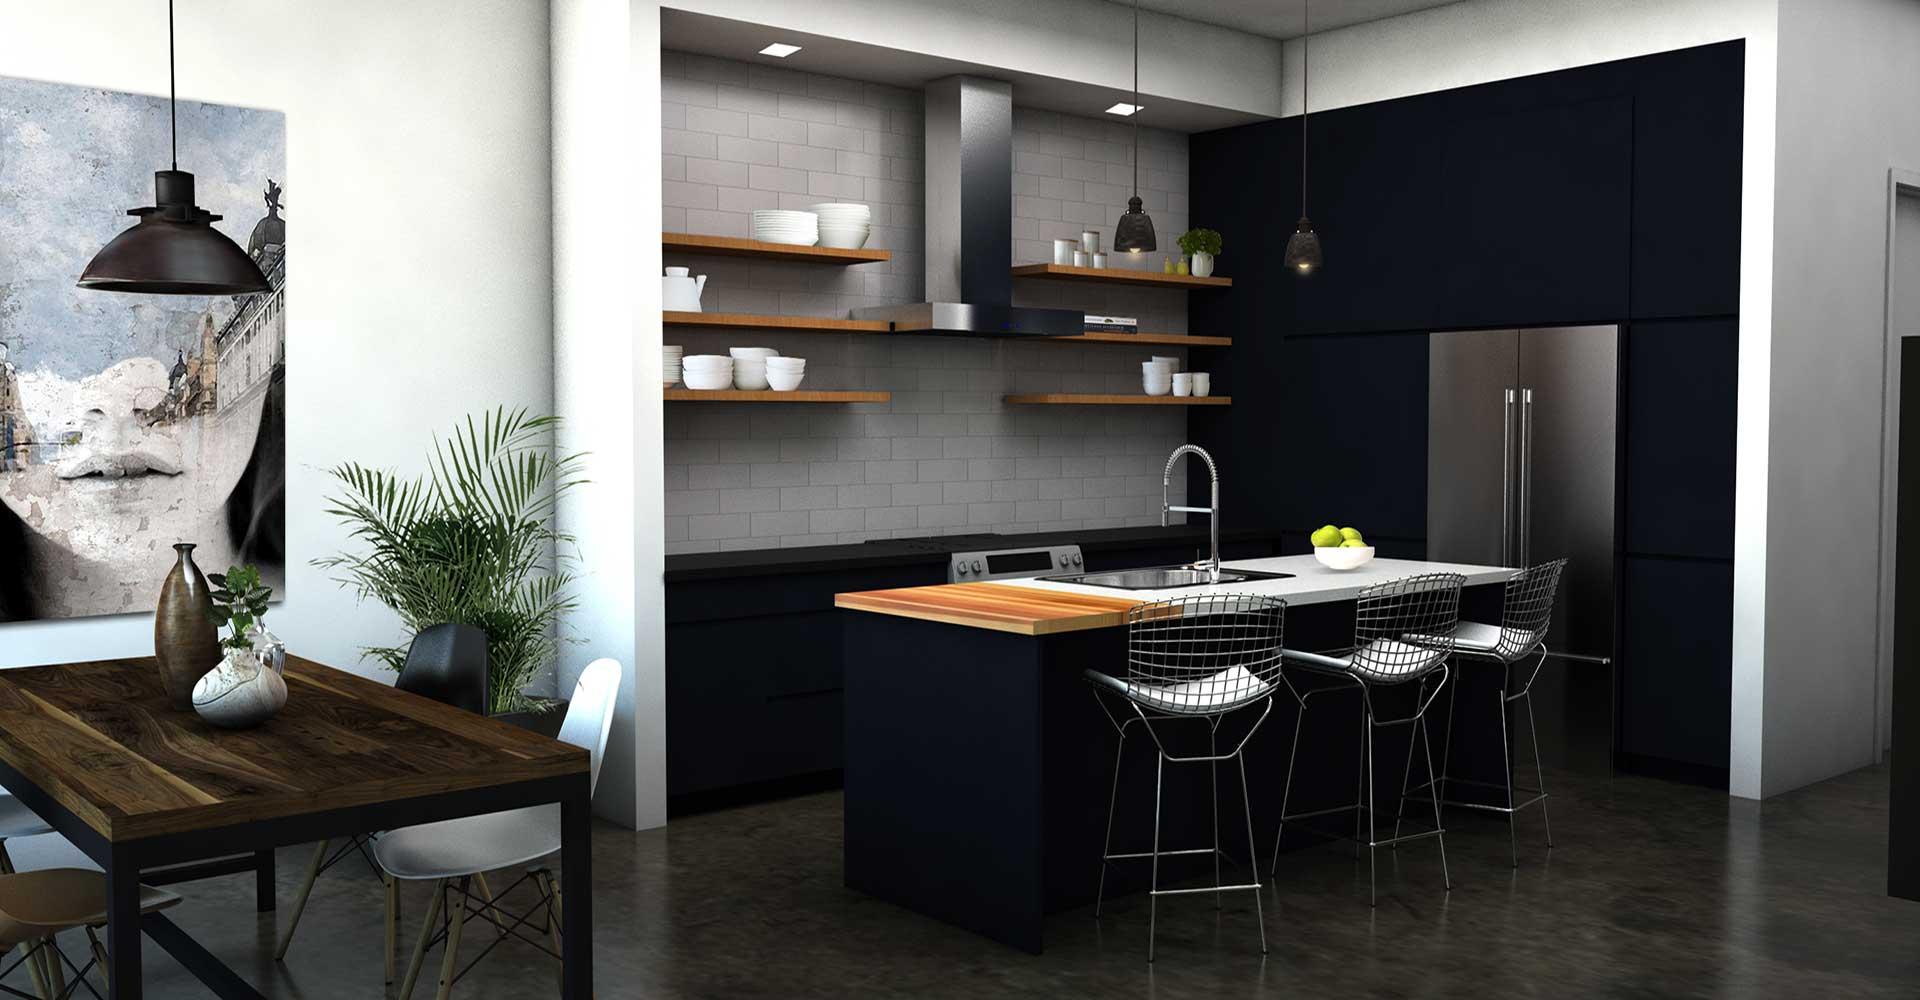 Kitchen Base Rendering Image